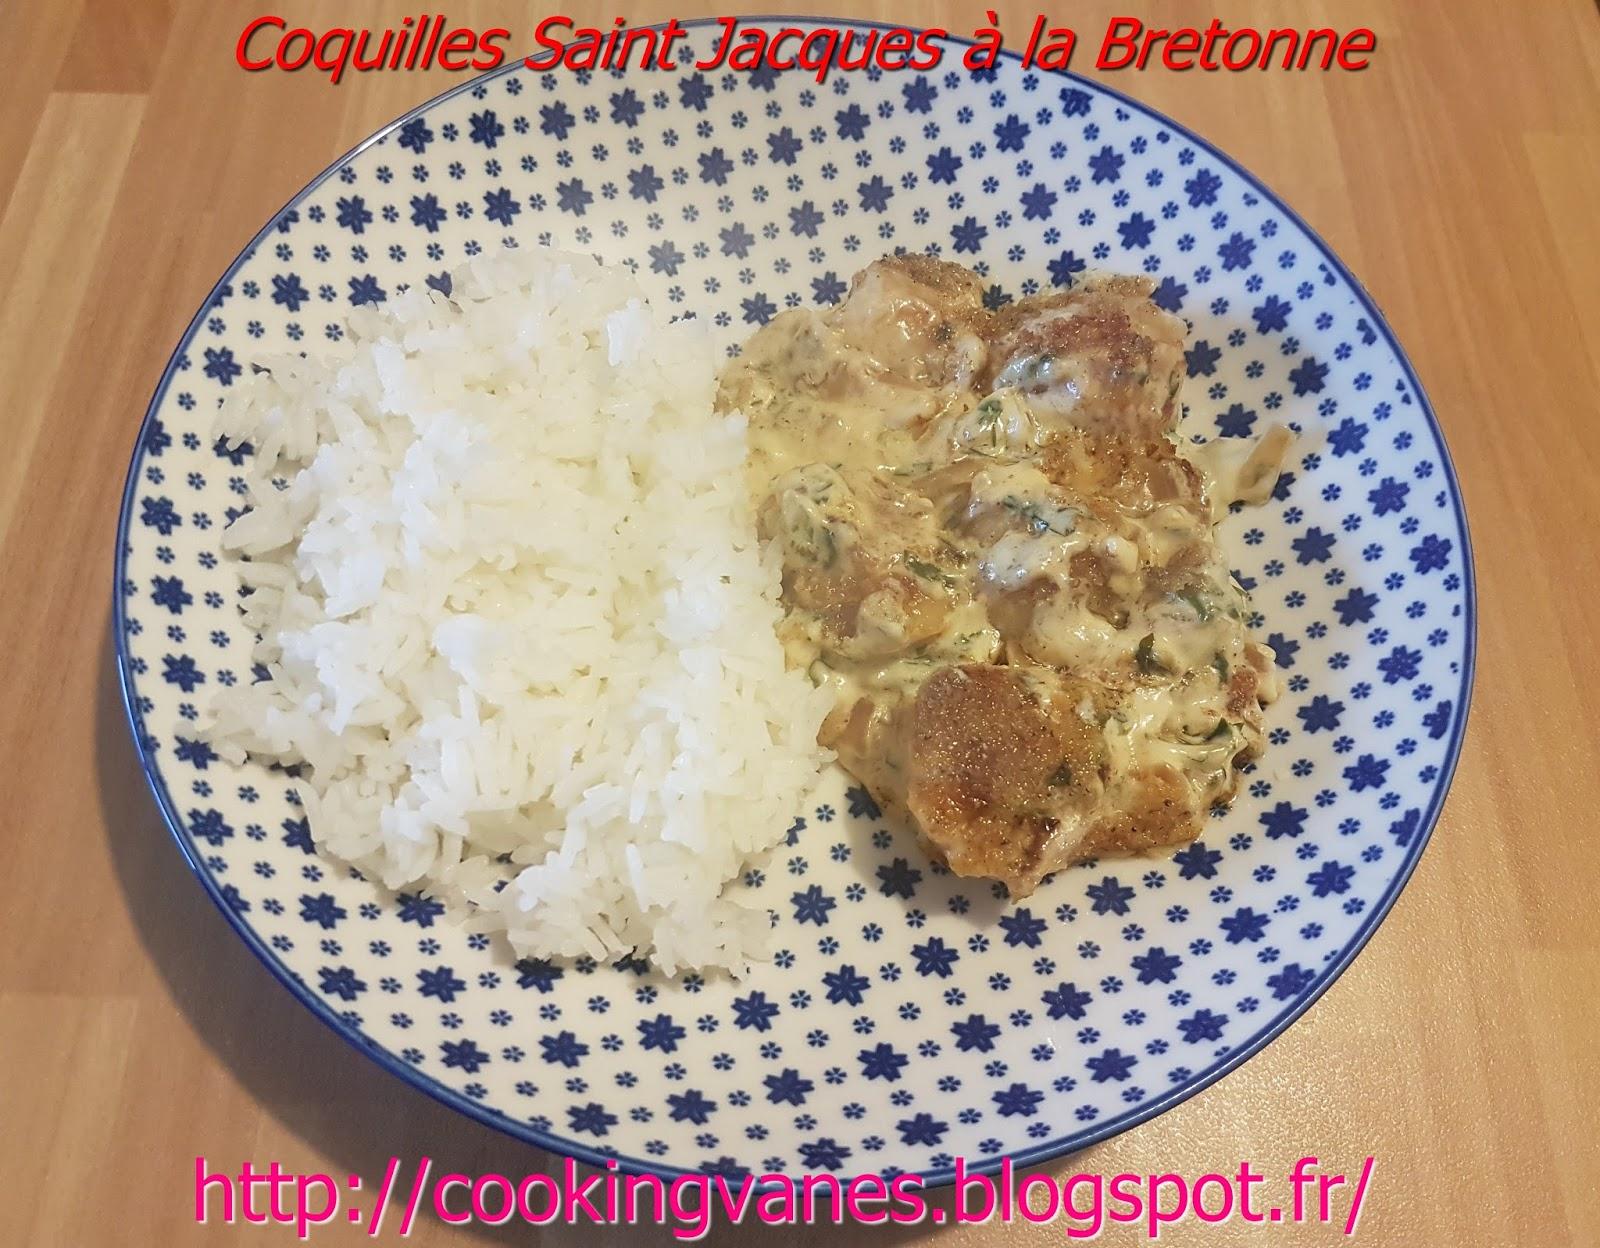 La cuisine de mimi coquilles saint jacques la bretonne - Coquille saint jacques bretonne ...